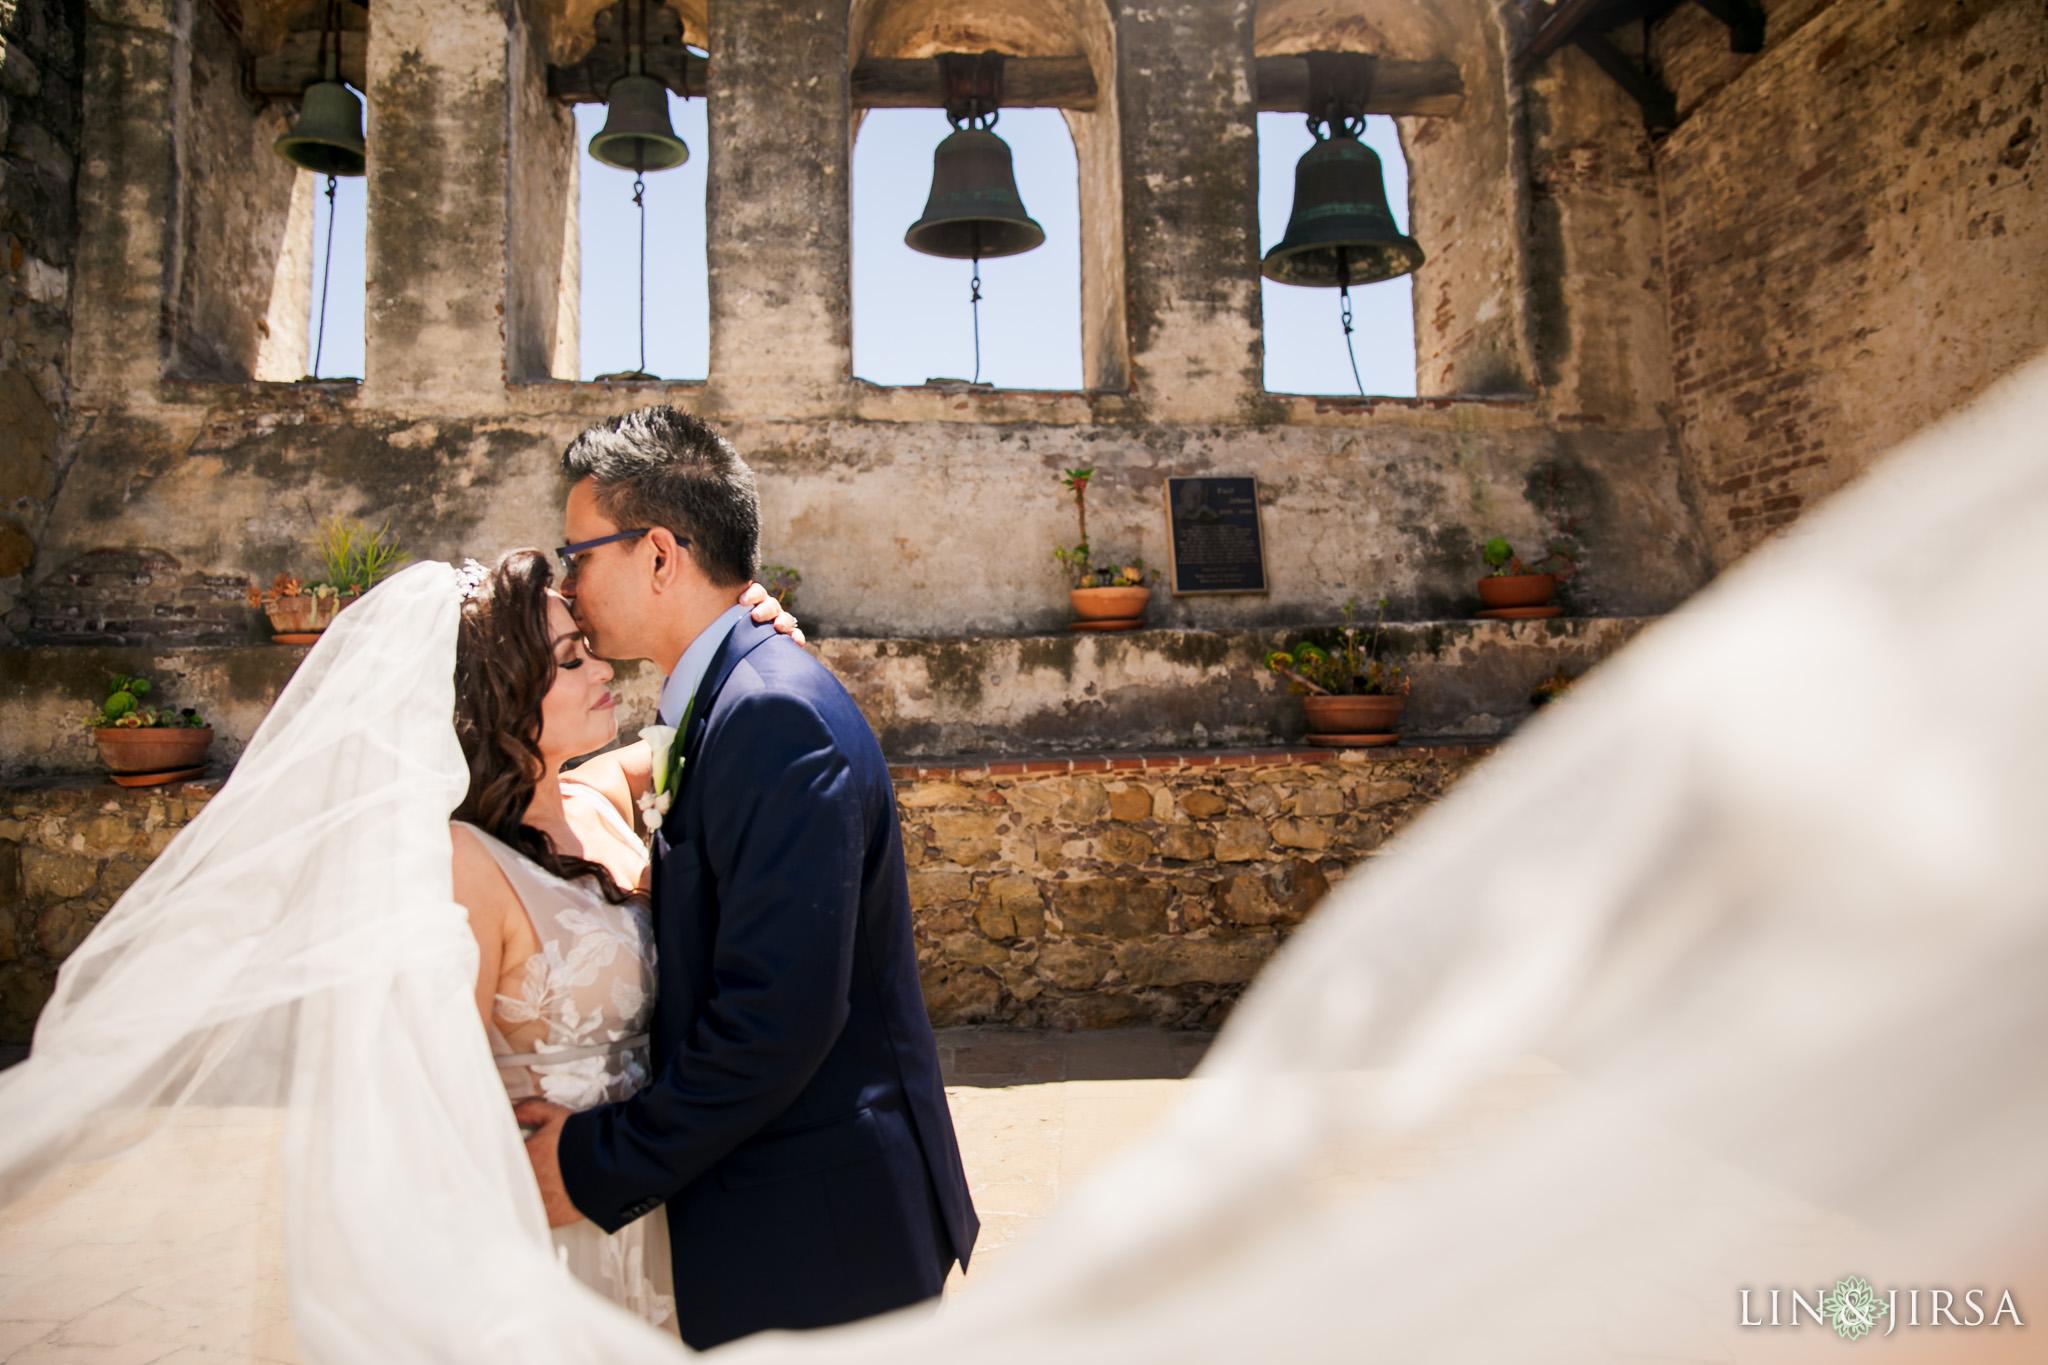 010 mission basilica san juan capistrano wedding photography